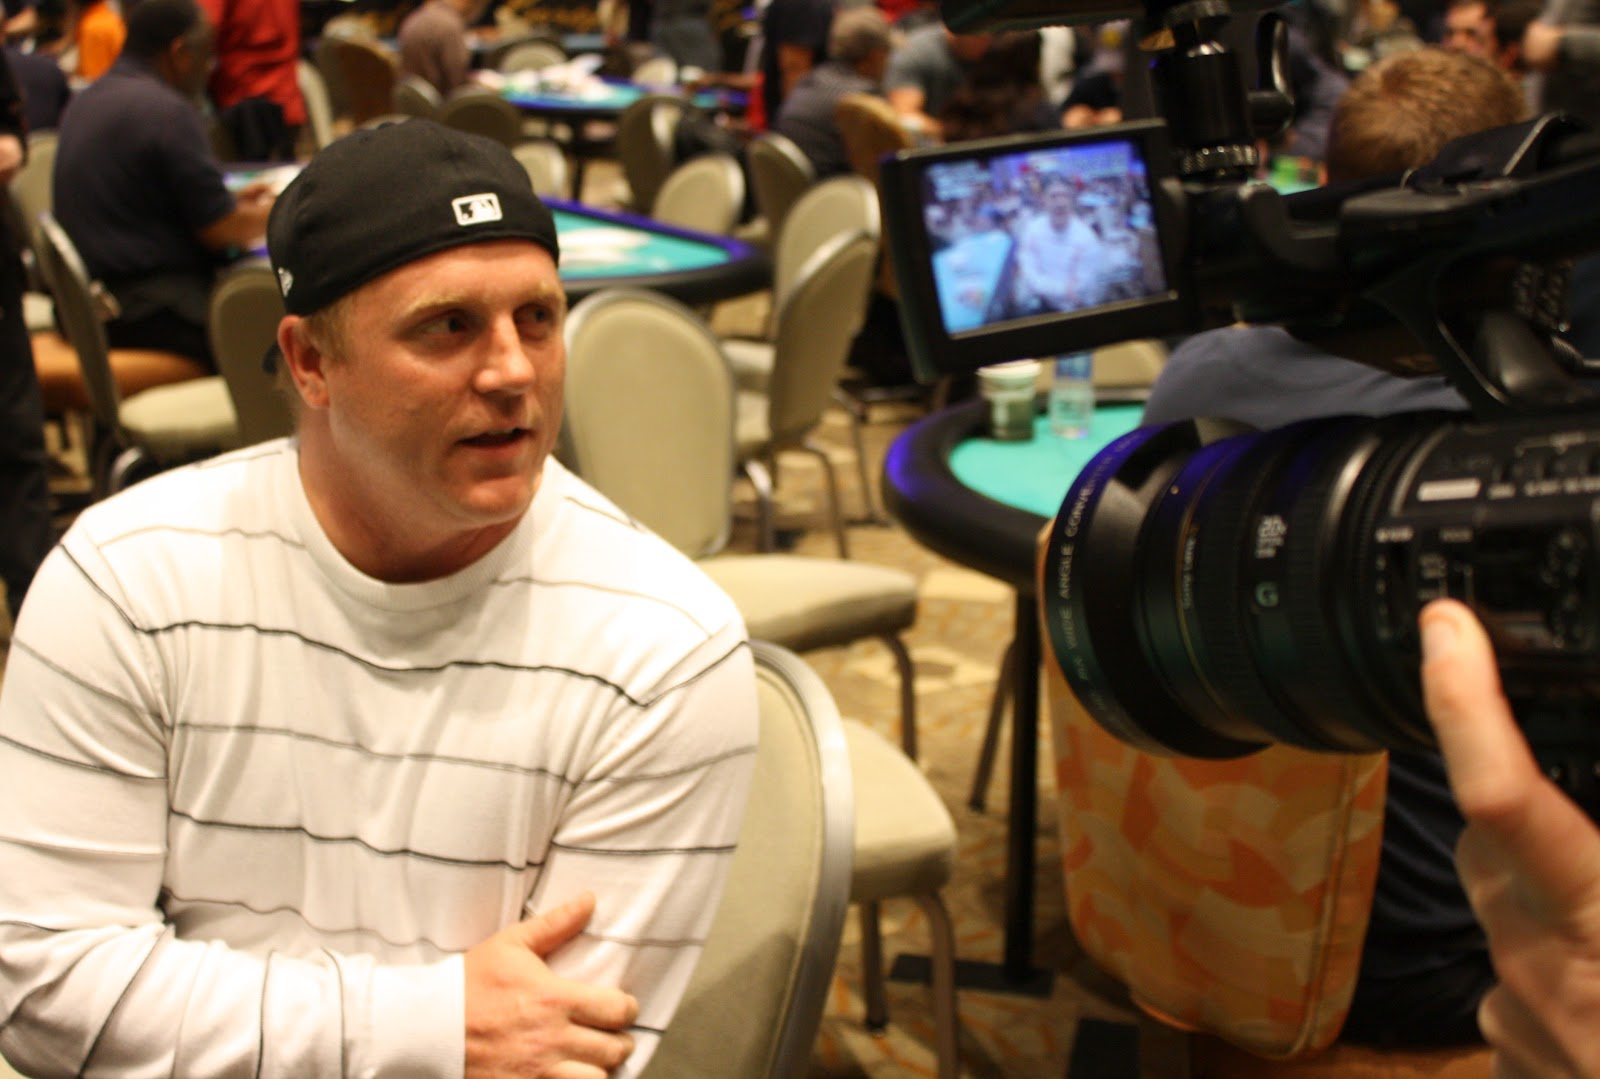 Jared hubbard poker